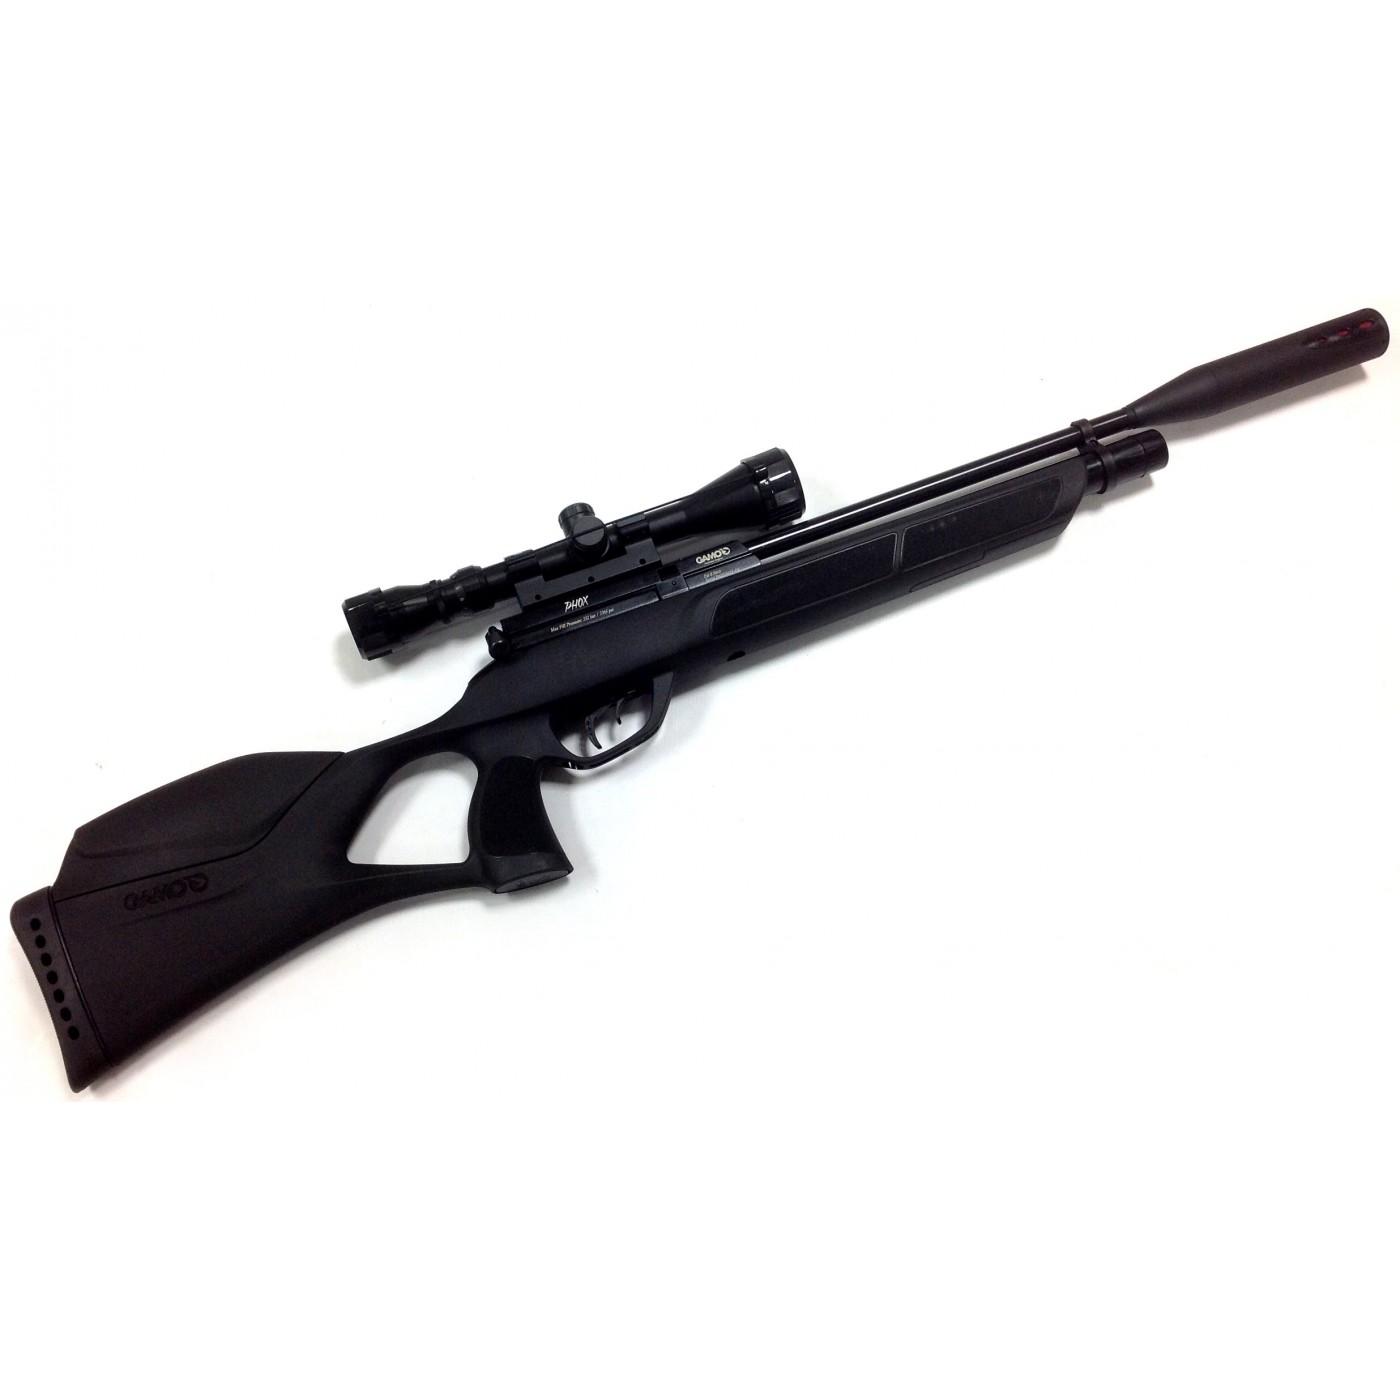 World S Strongest Air Rifle: GAMO PHOX  22 COMBO PACKAGE – Jerusalem